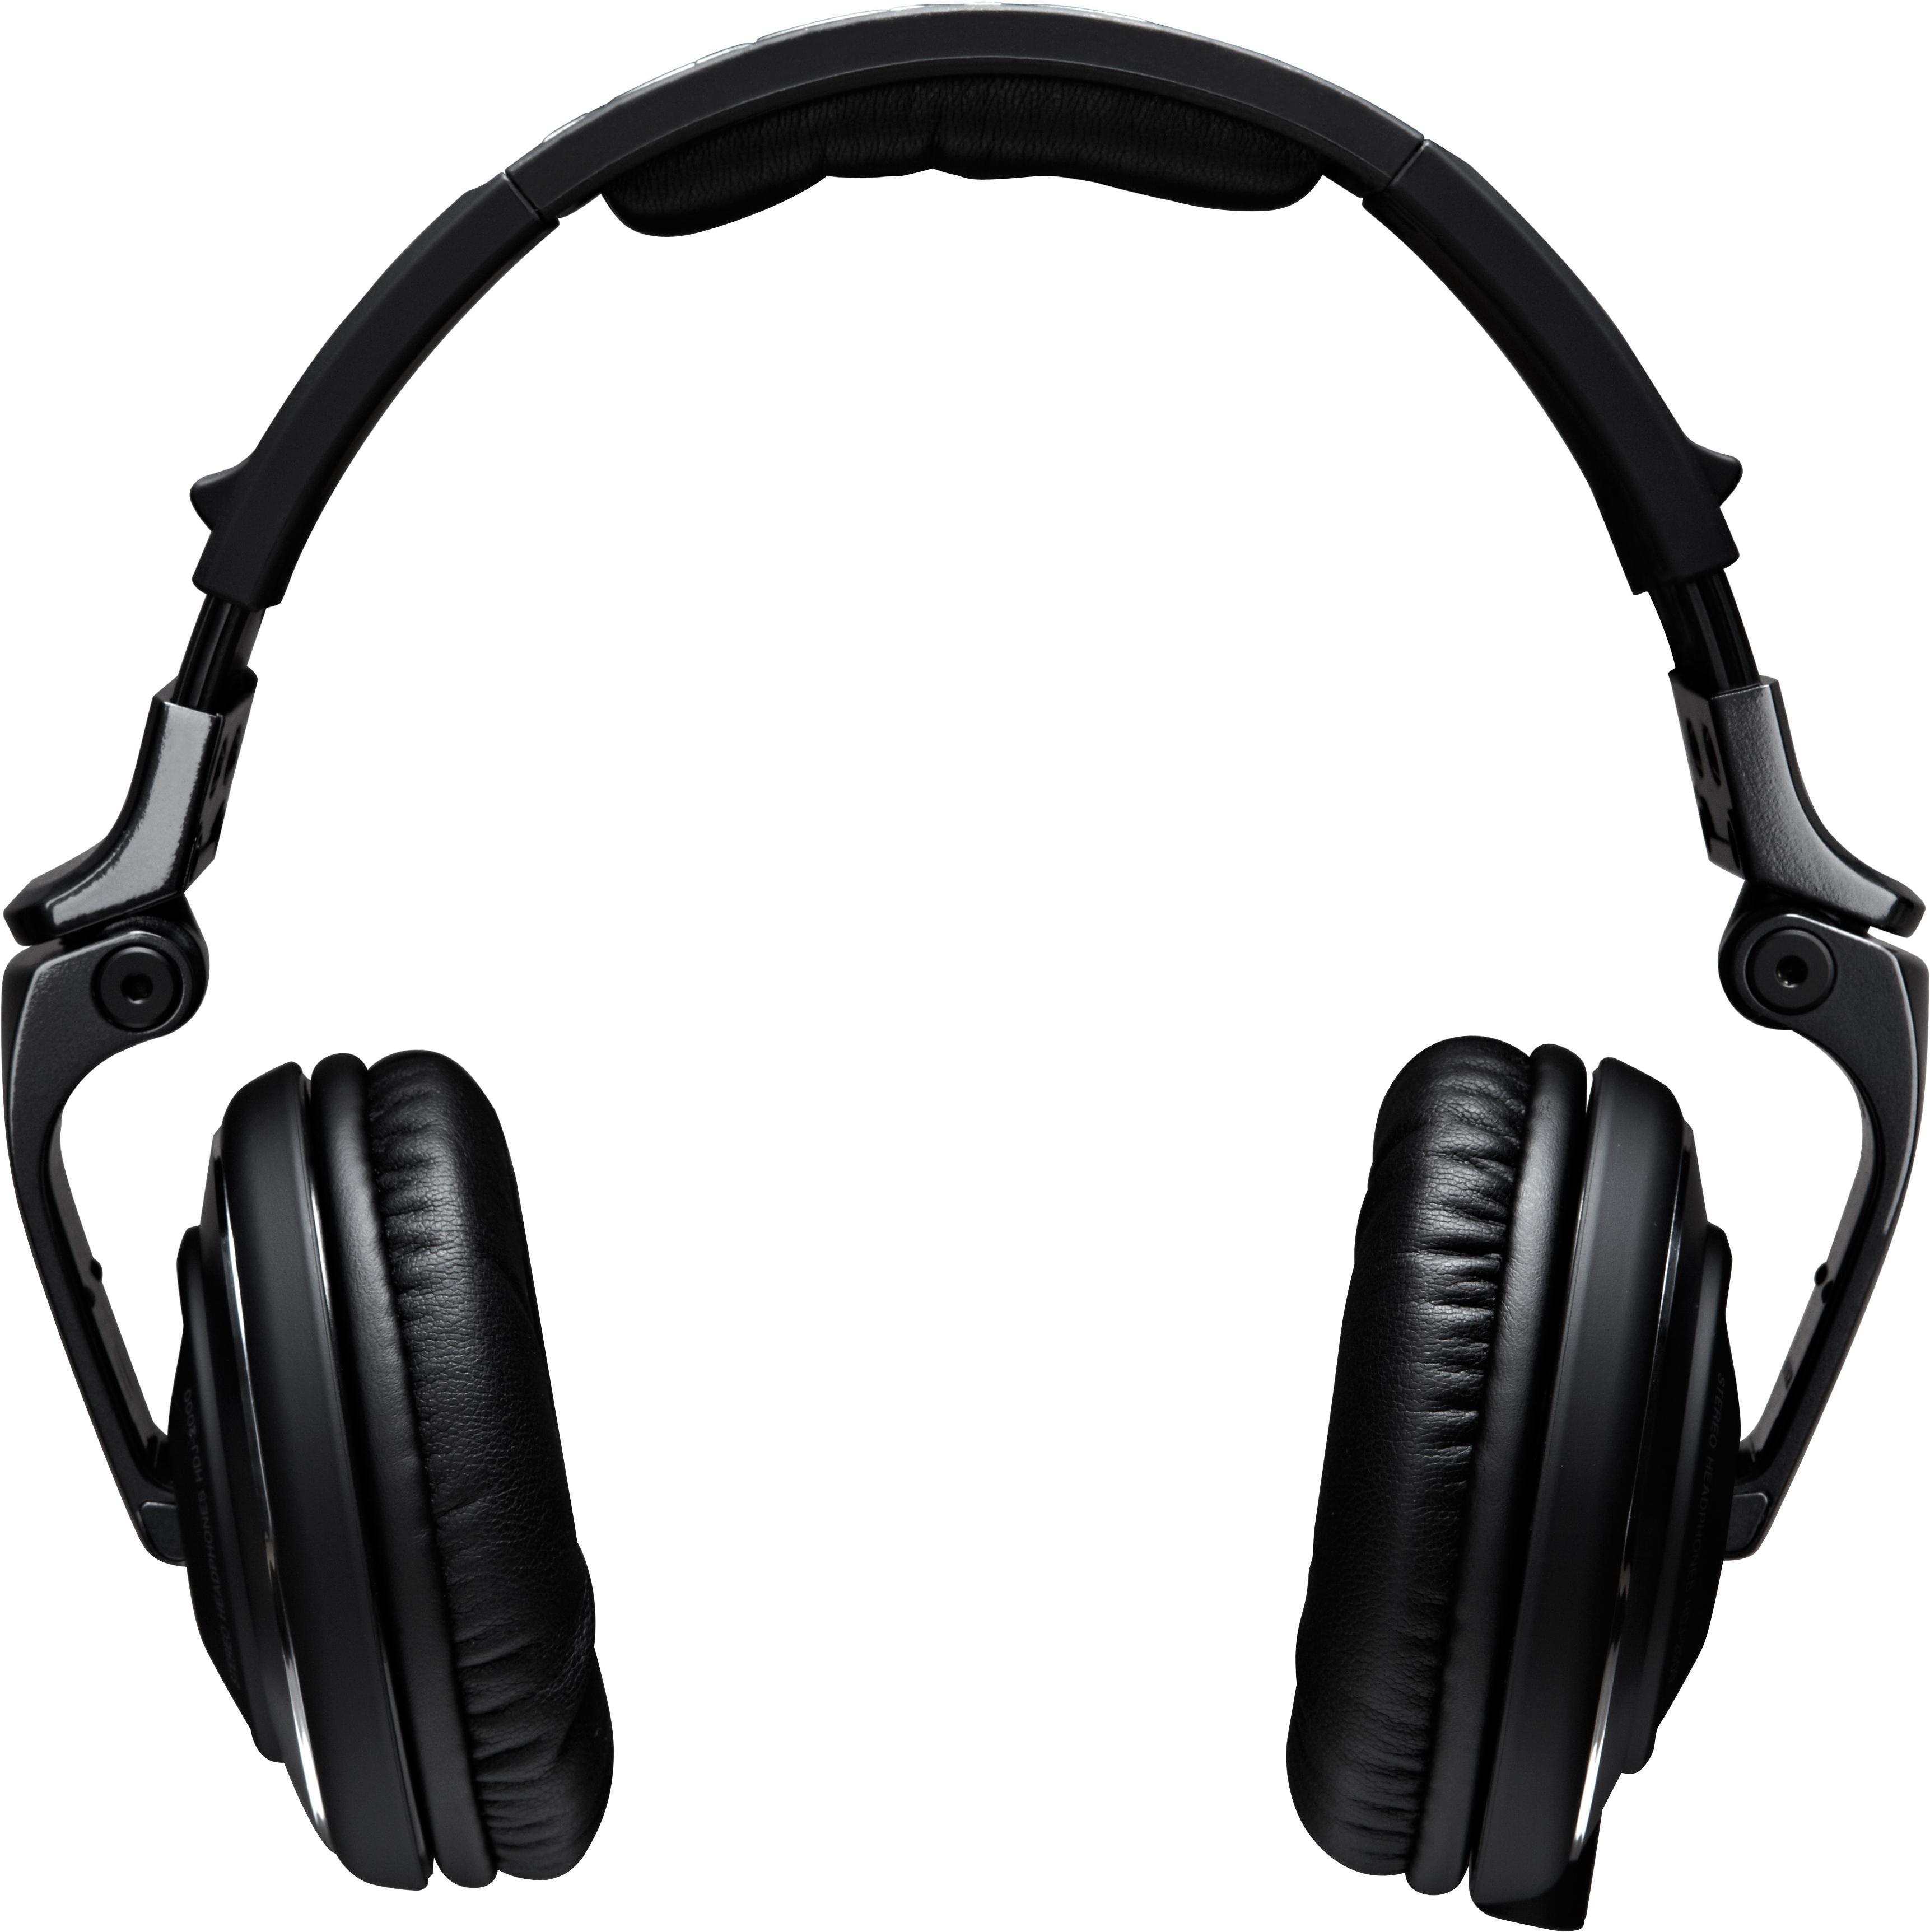 HDJ-2000 front